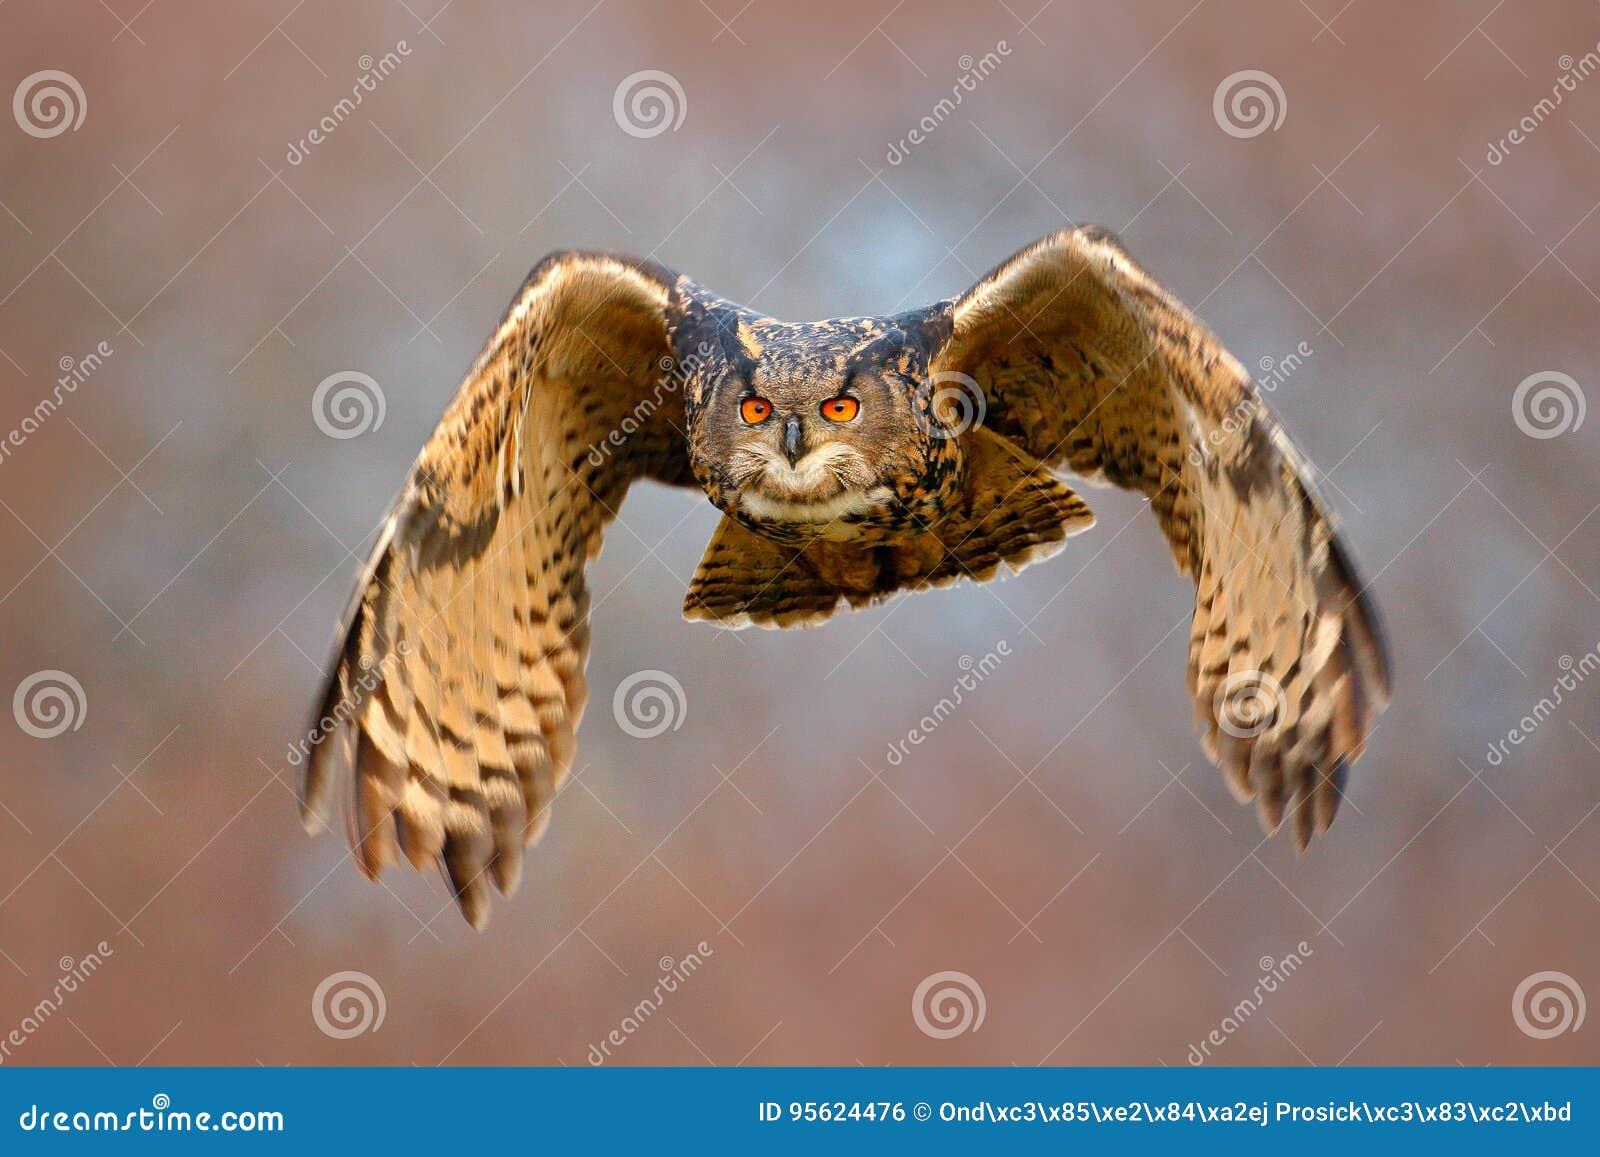 Framsidafluga av ugglan FlygEurasianEagle uggla med öppna vingar med snöflingan i snöig skog under kall vinter Handlingdjurlivsce